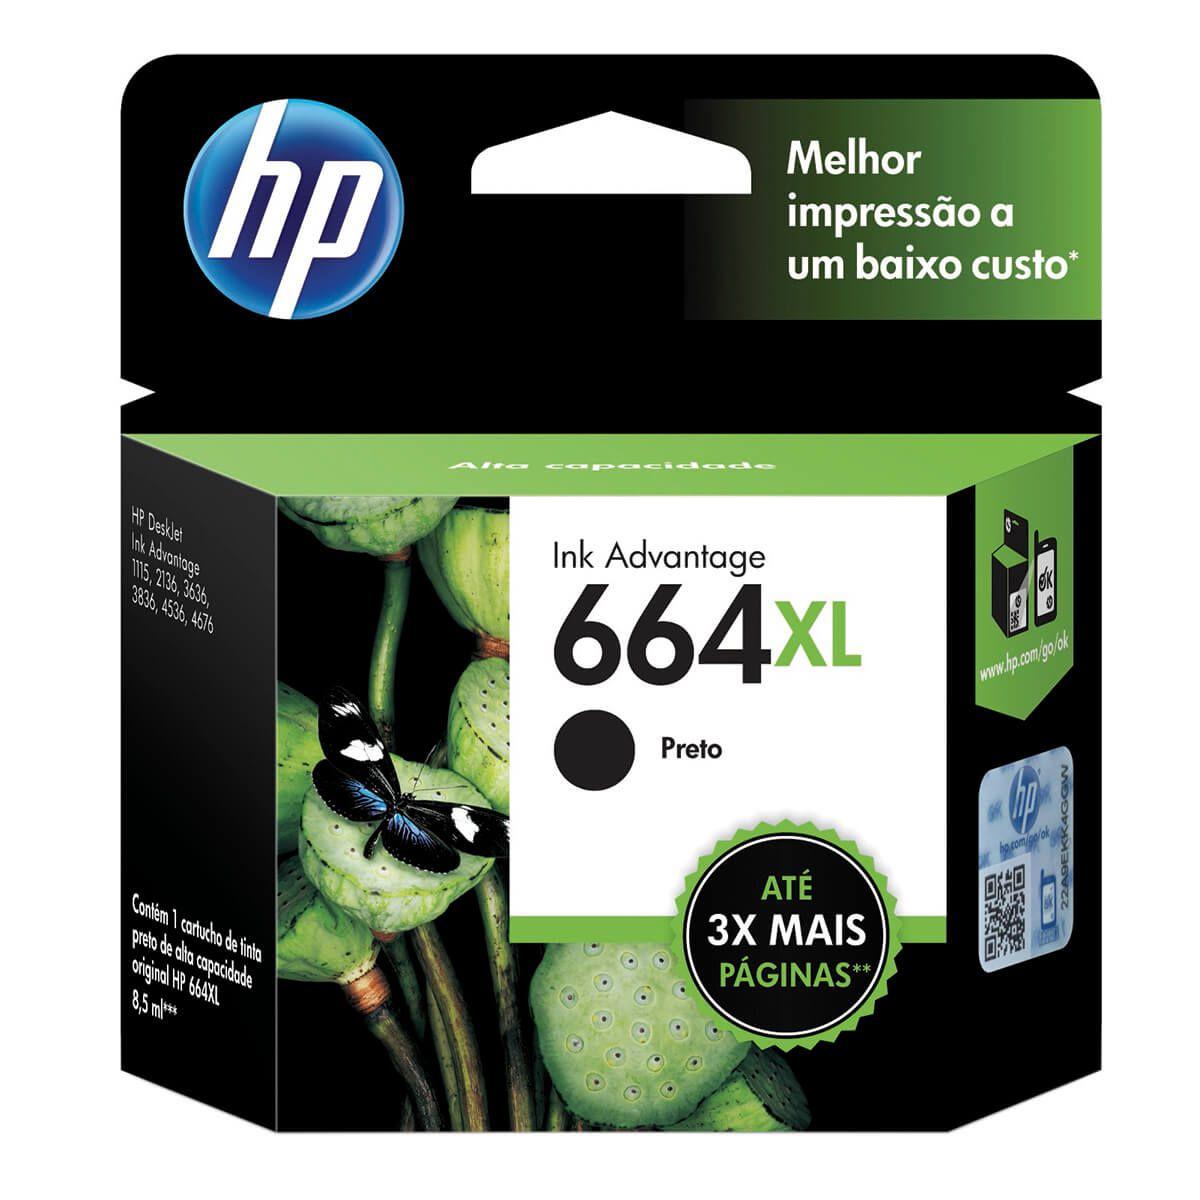 Cartucho HP FV31AB 664XL Preto 8,5ml Original